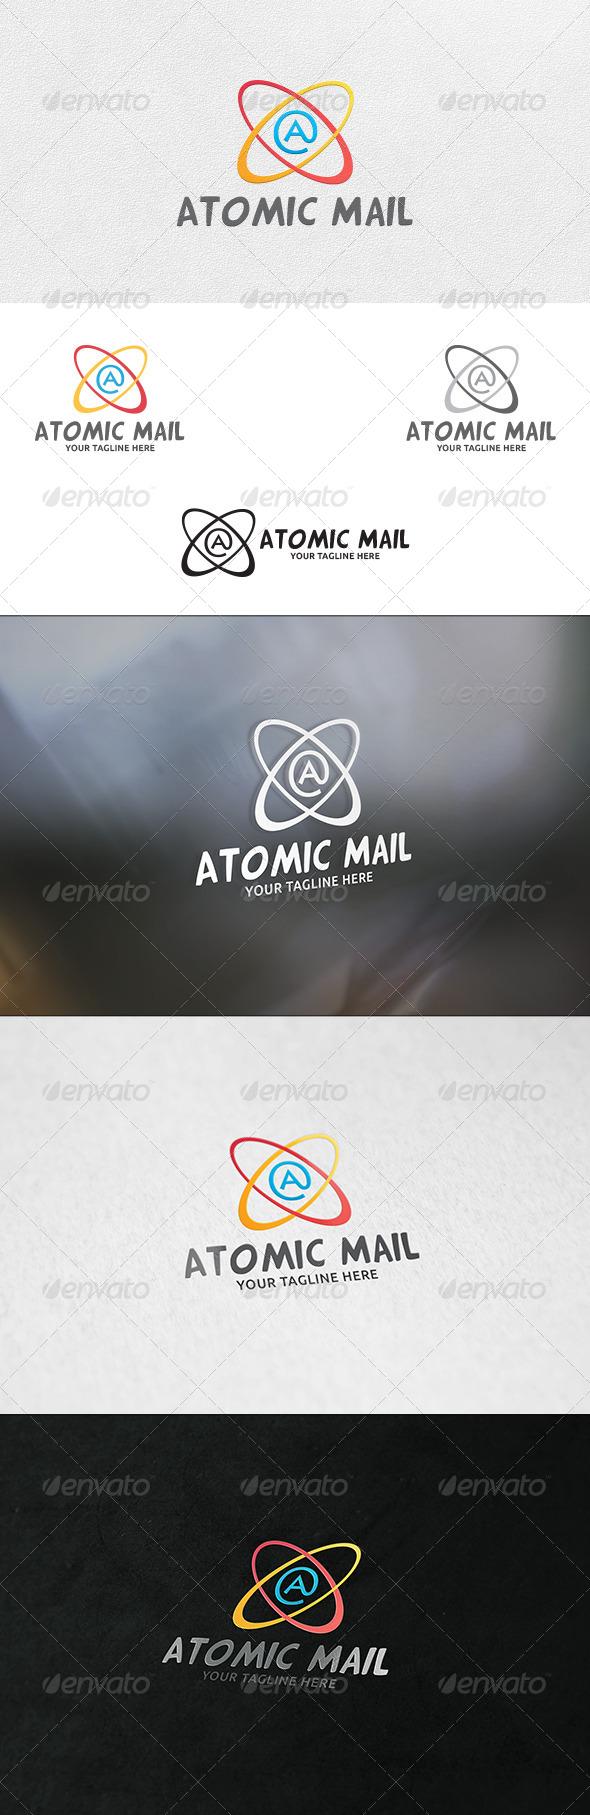 Atomic Mail - Logo Template - Symbols Logo Templates